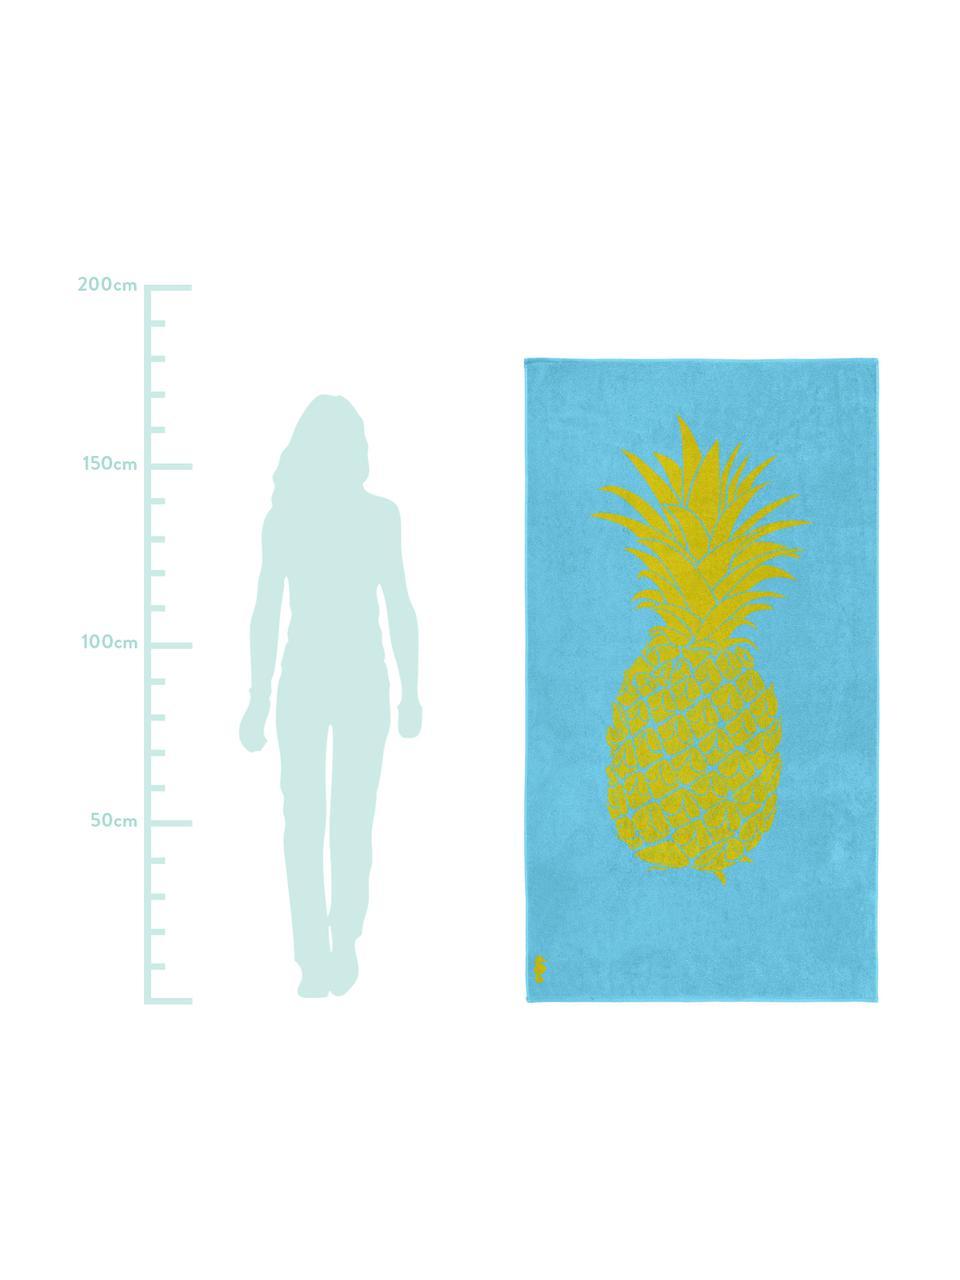 Strandlaken Ananas, 100% fluweel (katoen) Middelzware stofkwaliteit, 420g/m², Lichtblauw, geel, 100 x 180 cm